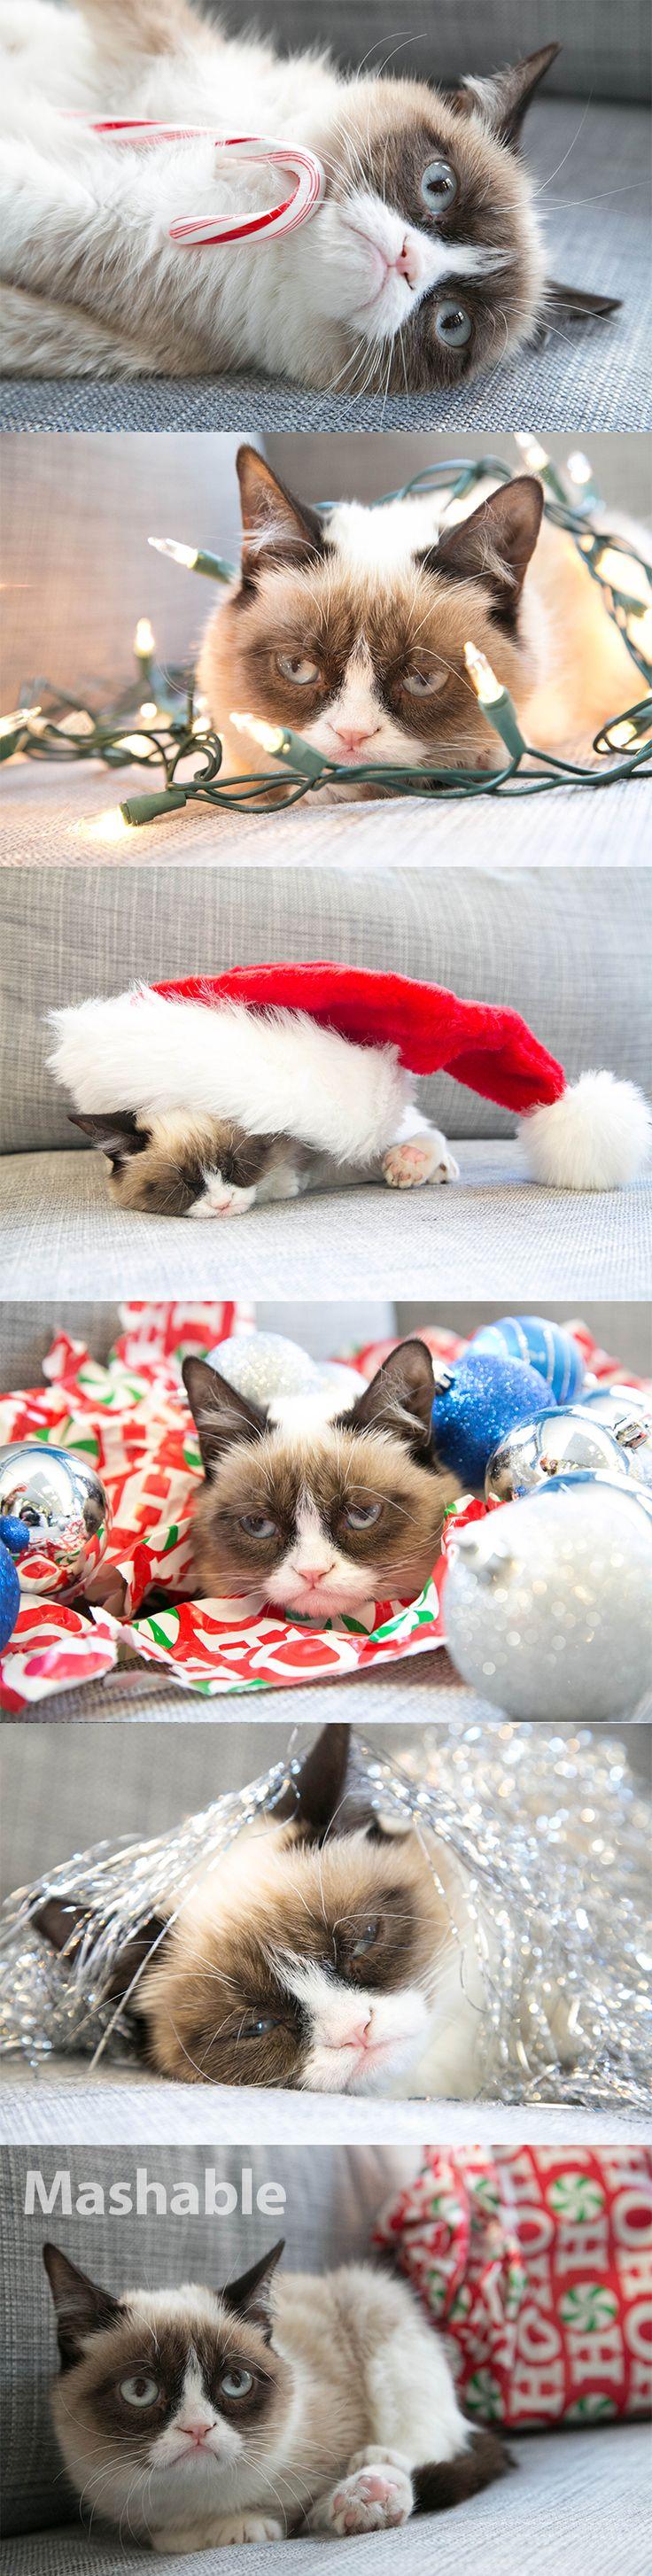 Grumpy Cat Christmas montage.